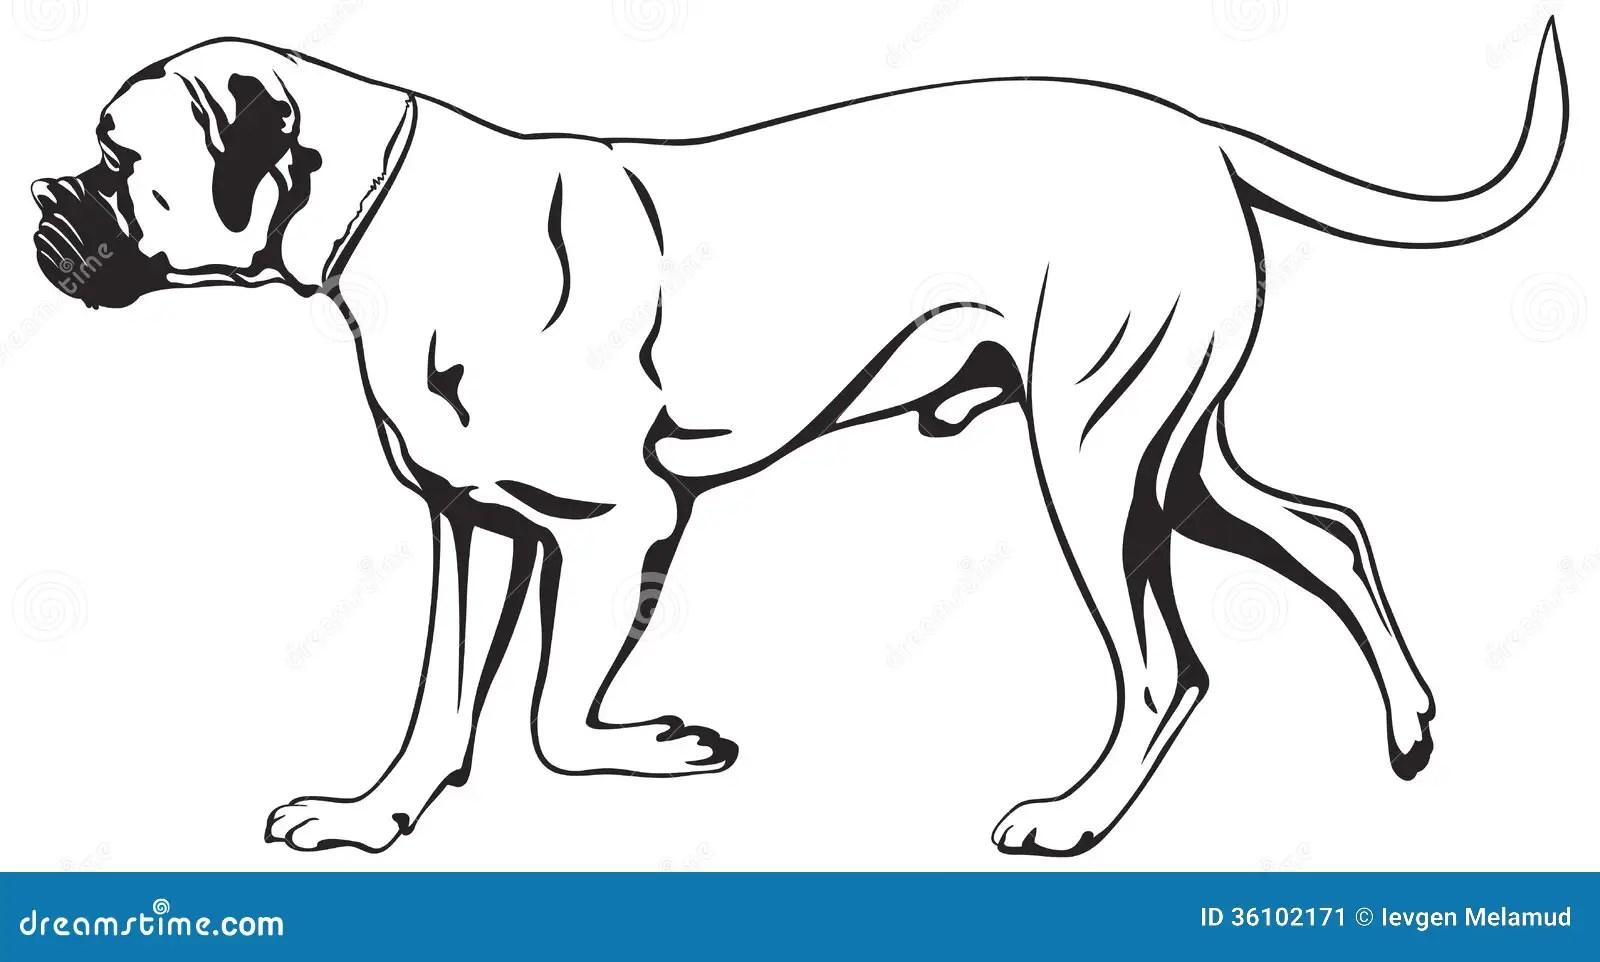 Guard Dog Security Maximum Voltage Stealth Flashlight